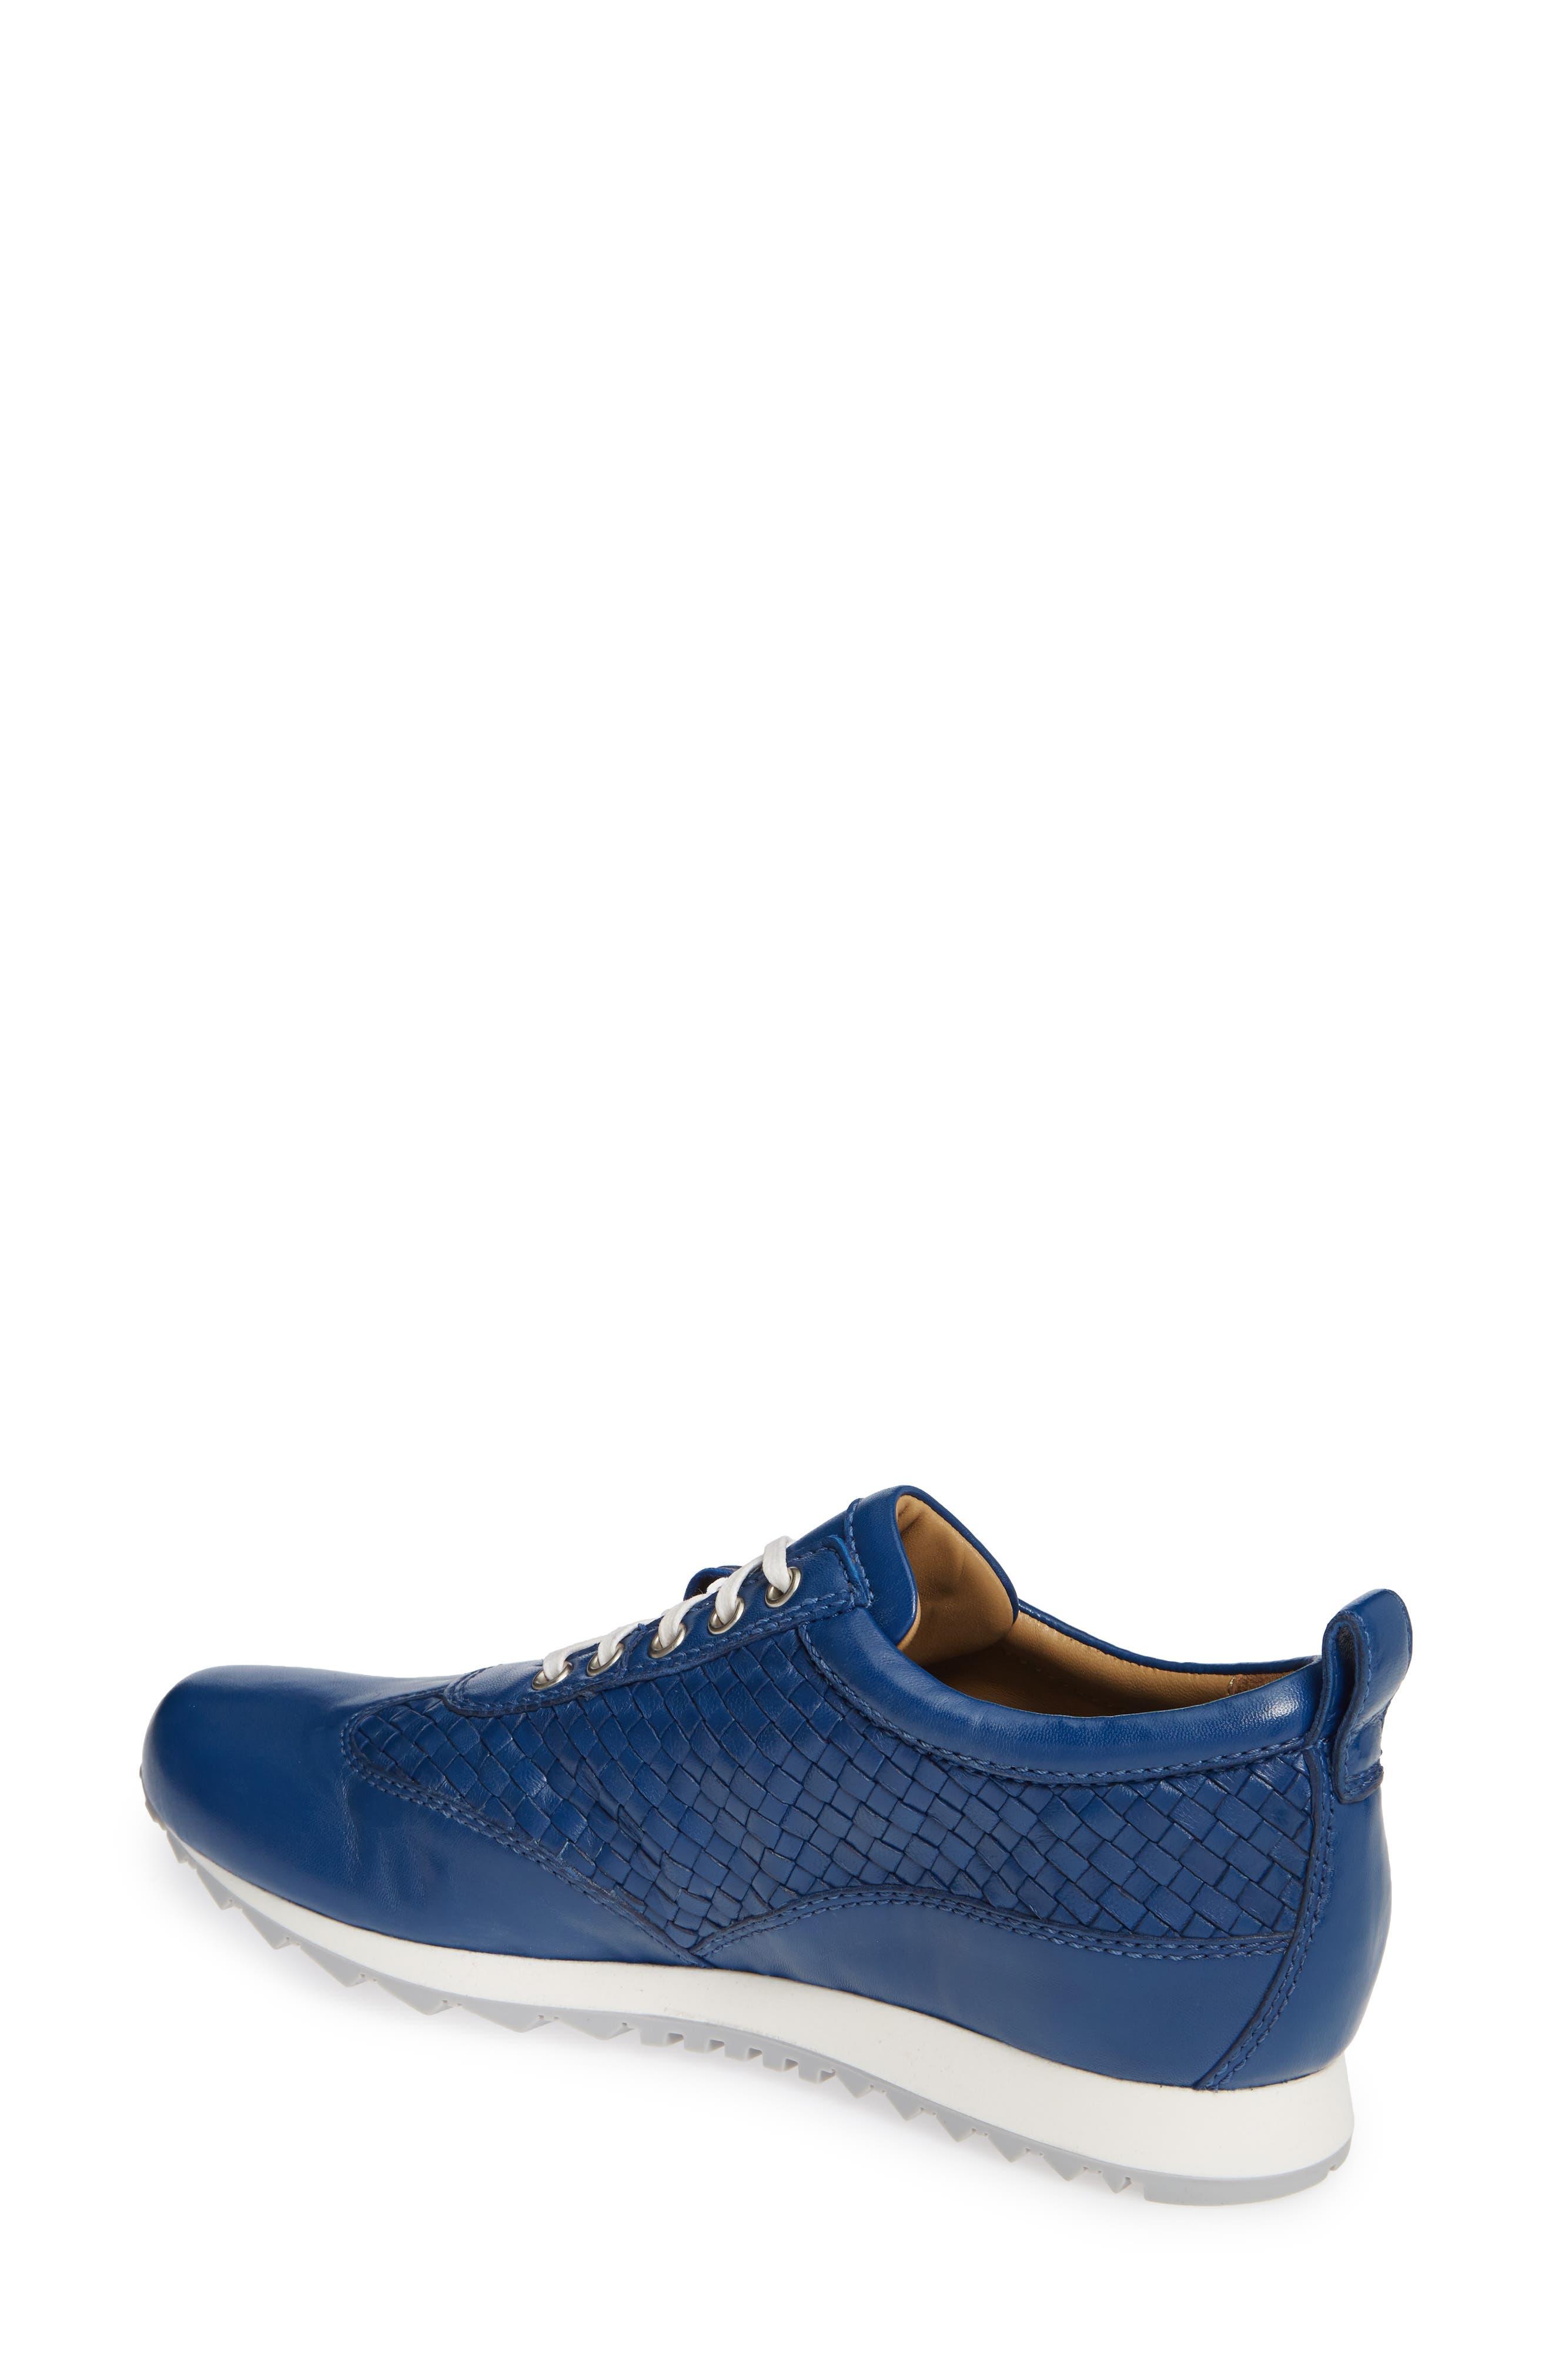 Sportive Woven Sneaker,                             Alternate thumbnail 2, color,                             423